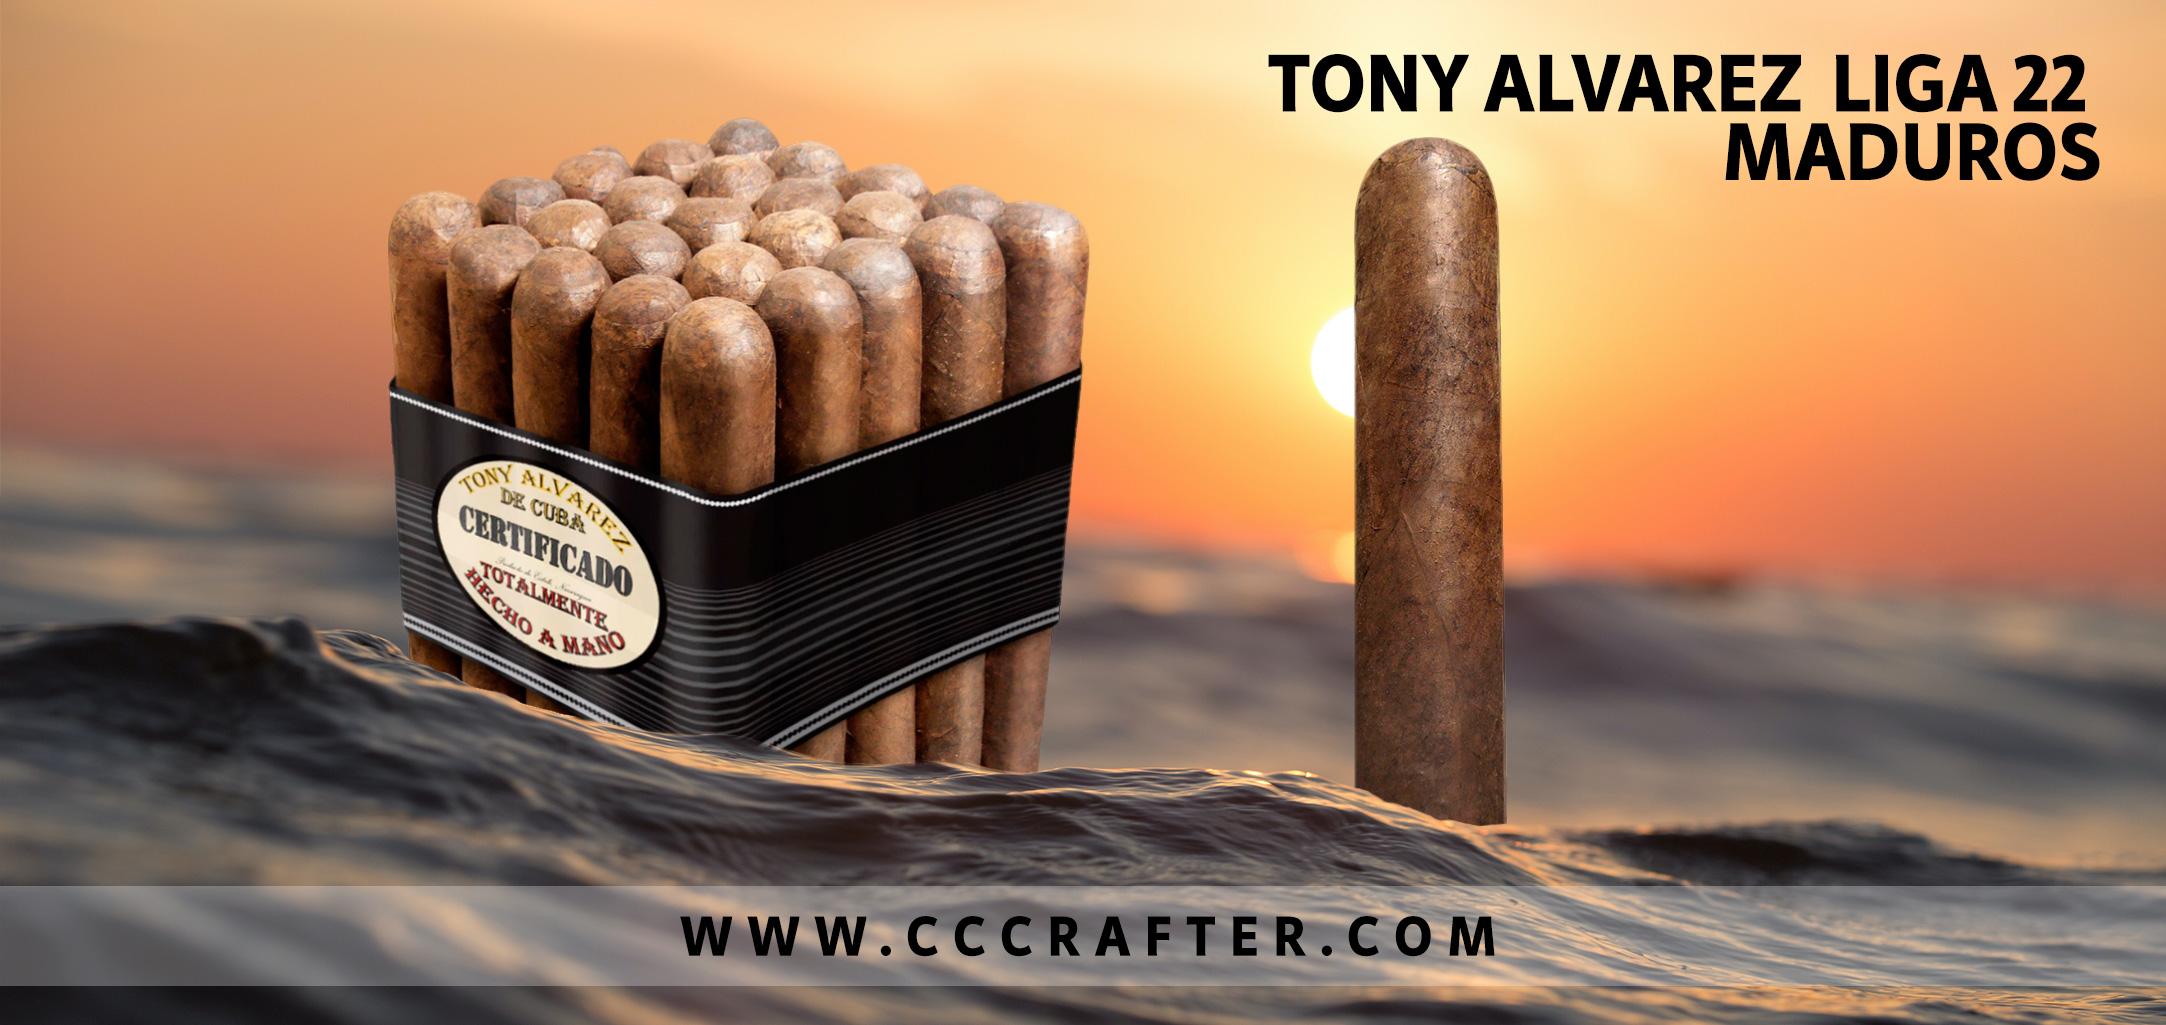 tony-alvarez-liga-22-maduros-banner.jpg